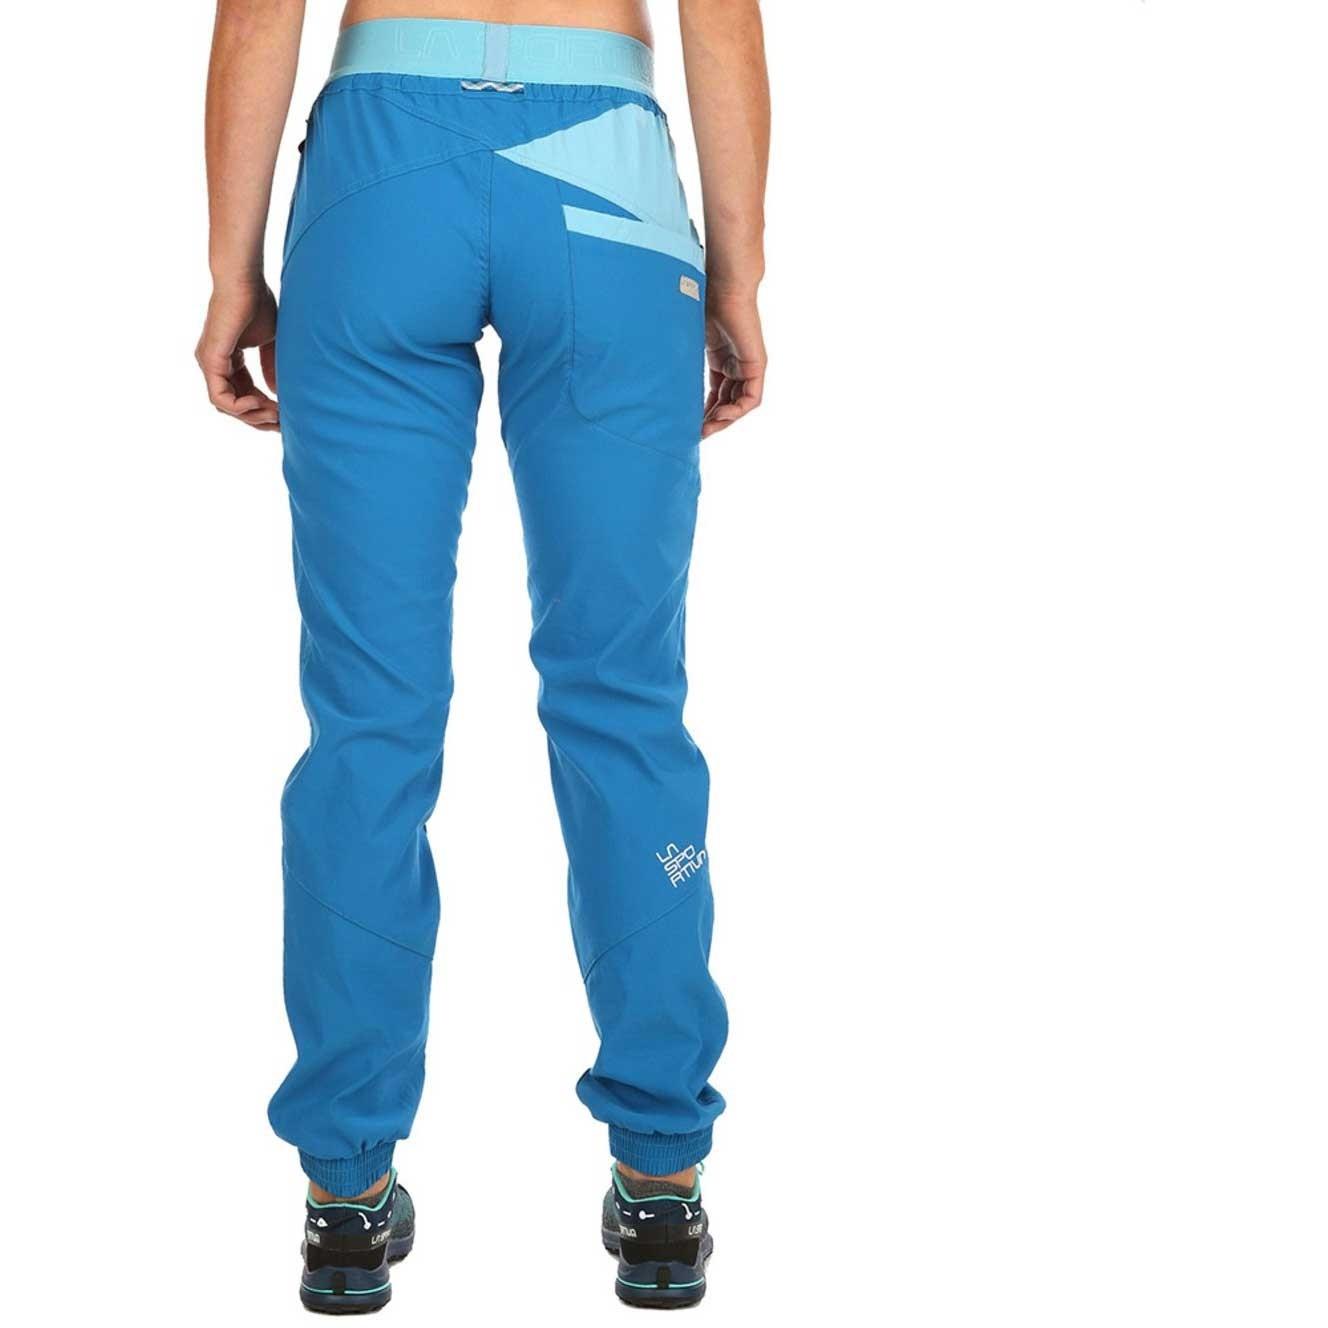 La Sportiva Mantra Pants - Women's - Neptune/Pacific Blue